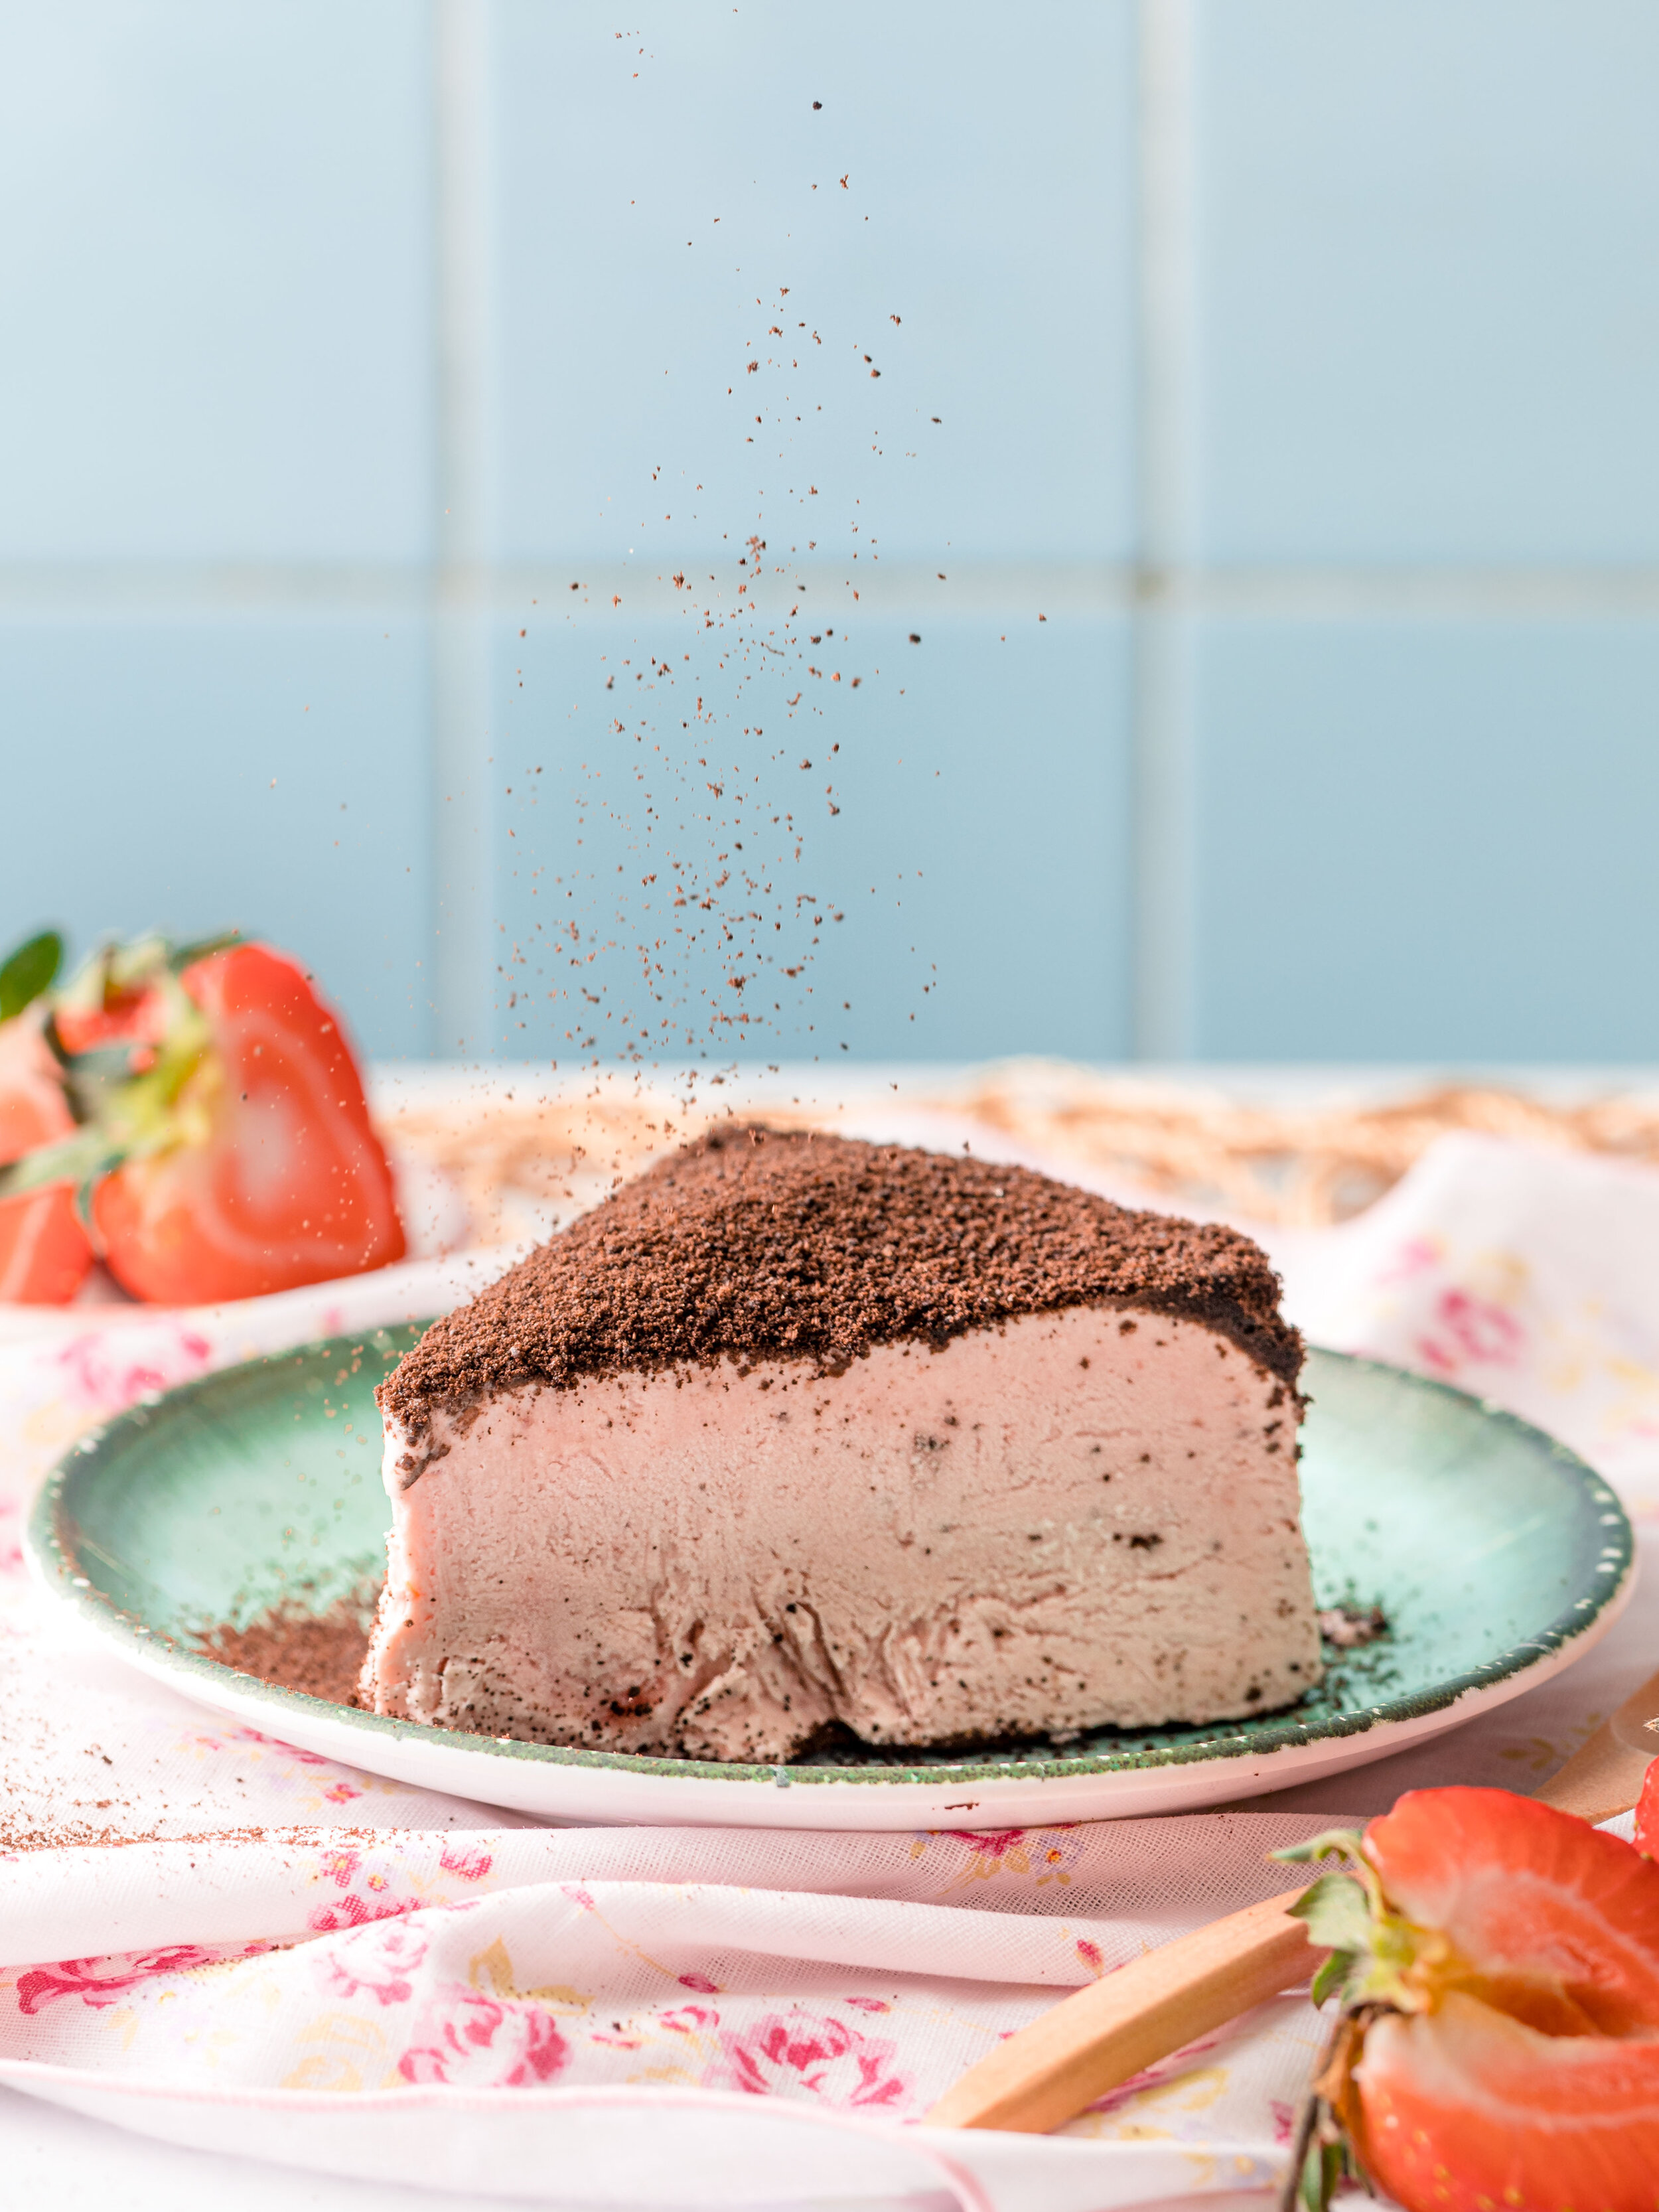 Ming_Kee_Dessert_Belinda_Jiao